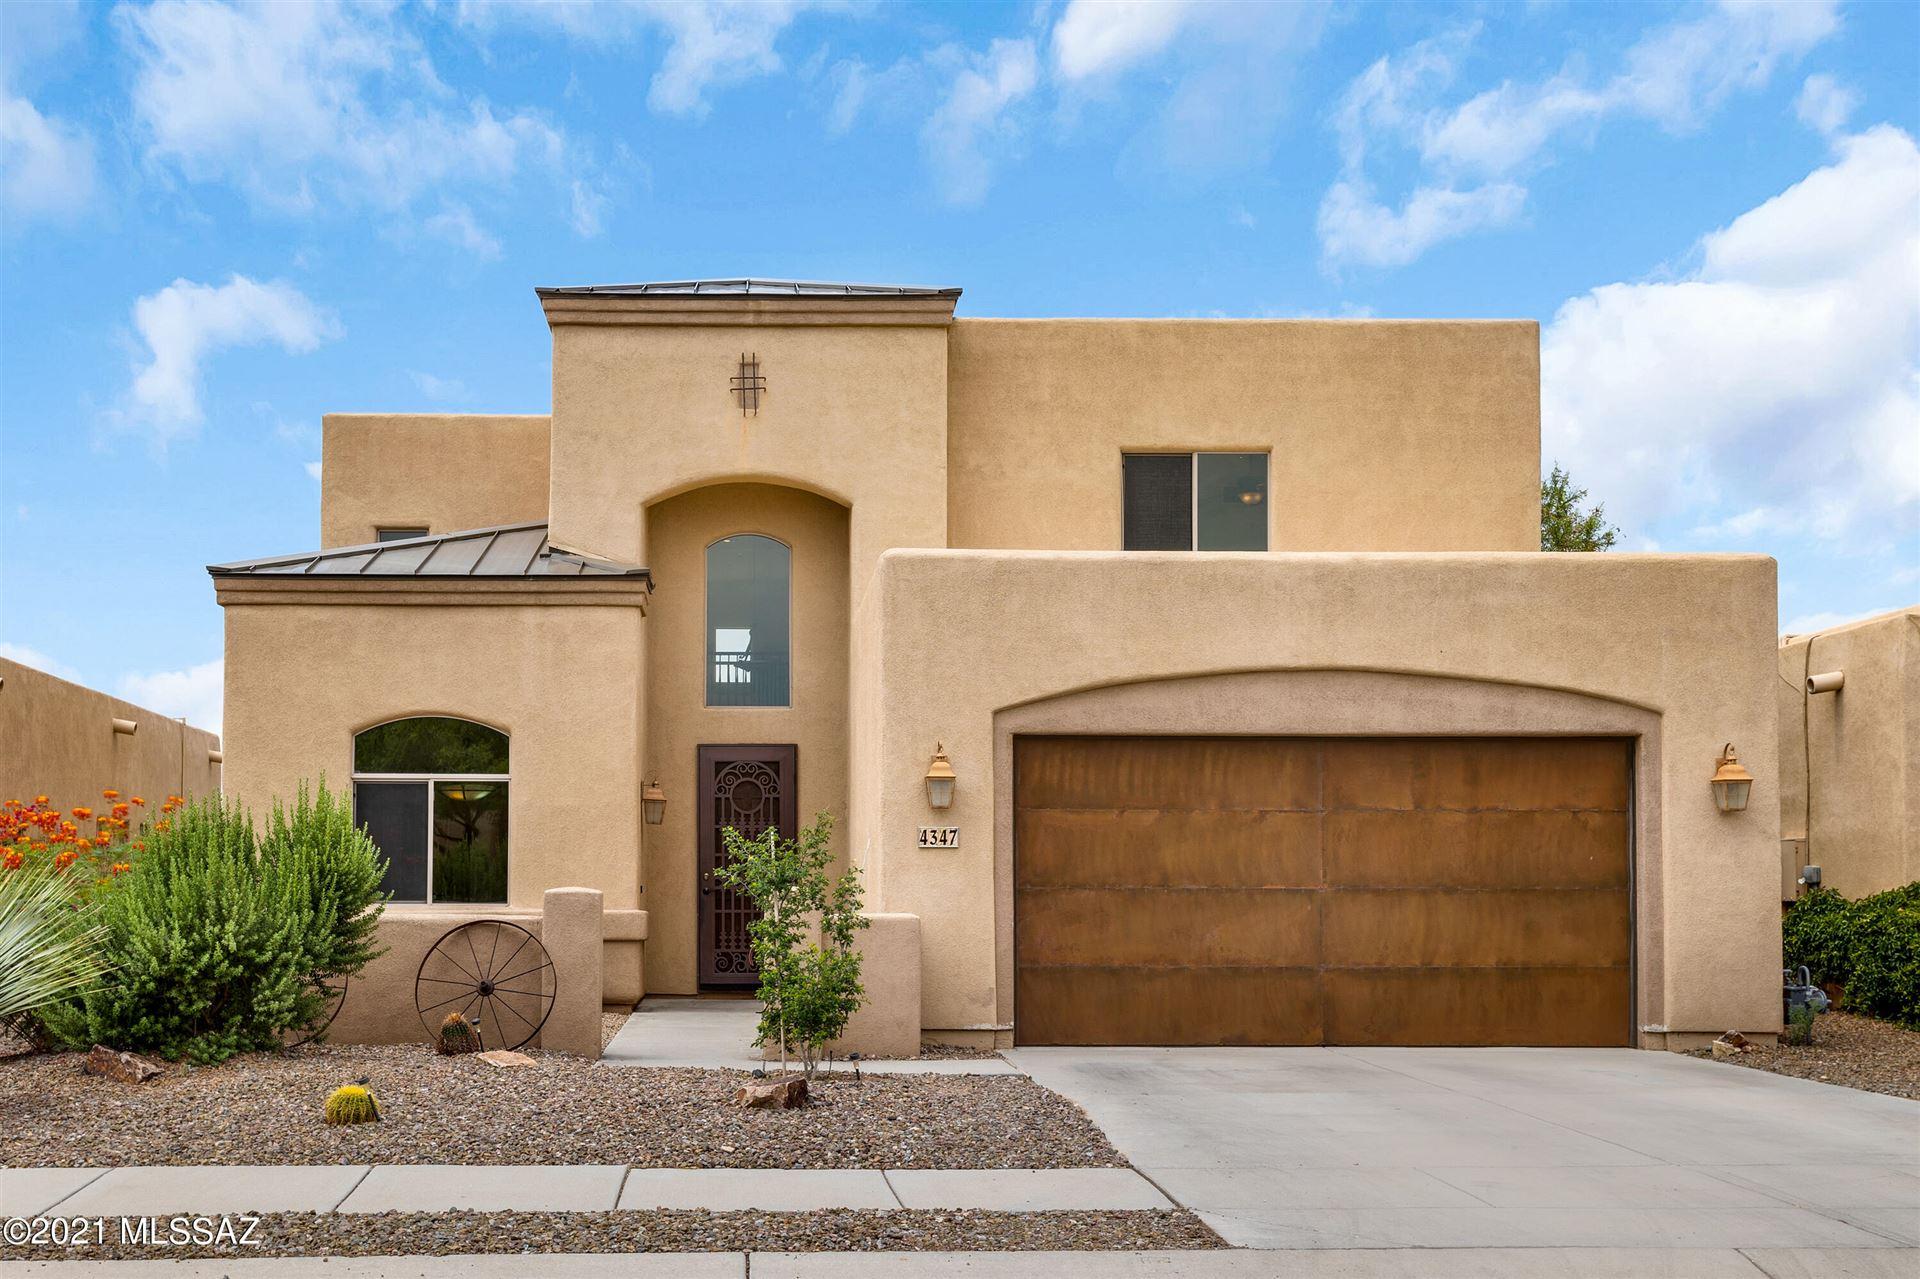 4347 W Cloud Ranch Place, Marana, AZ 85658 - MLS#: 22118931